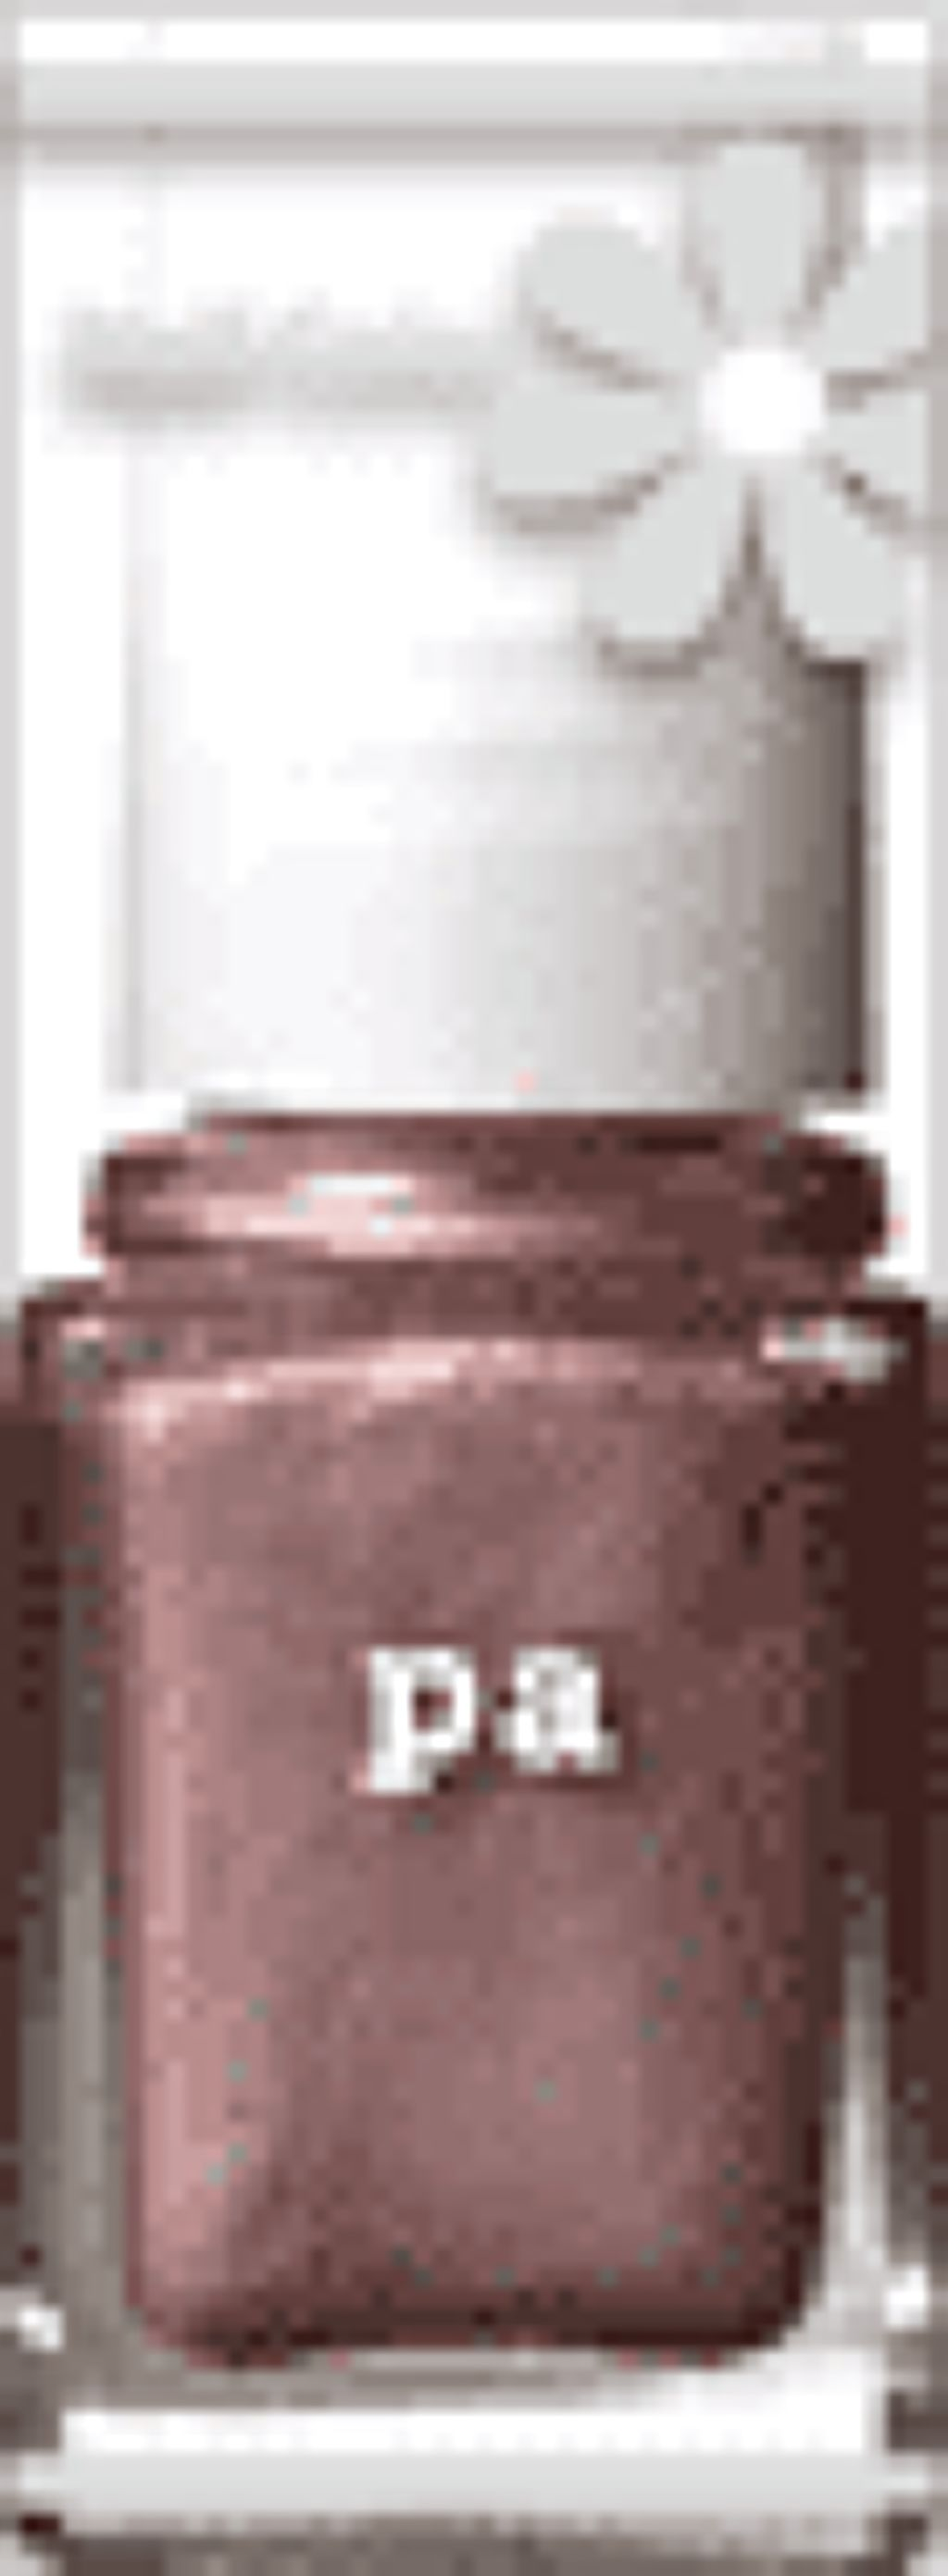 pa ネイルカラー(旧) A31